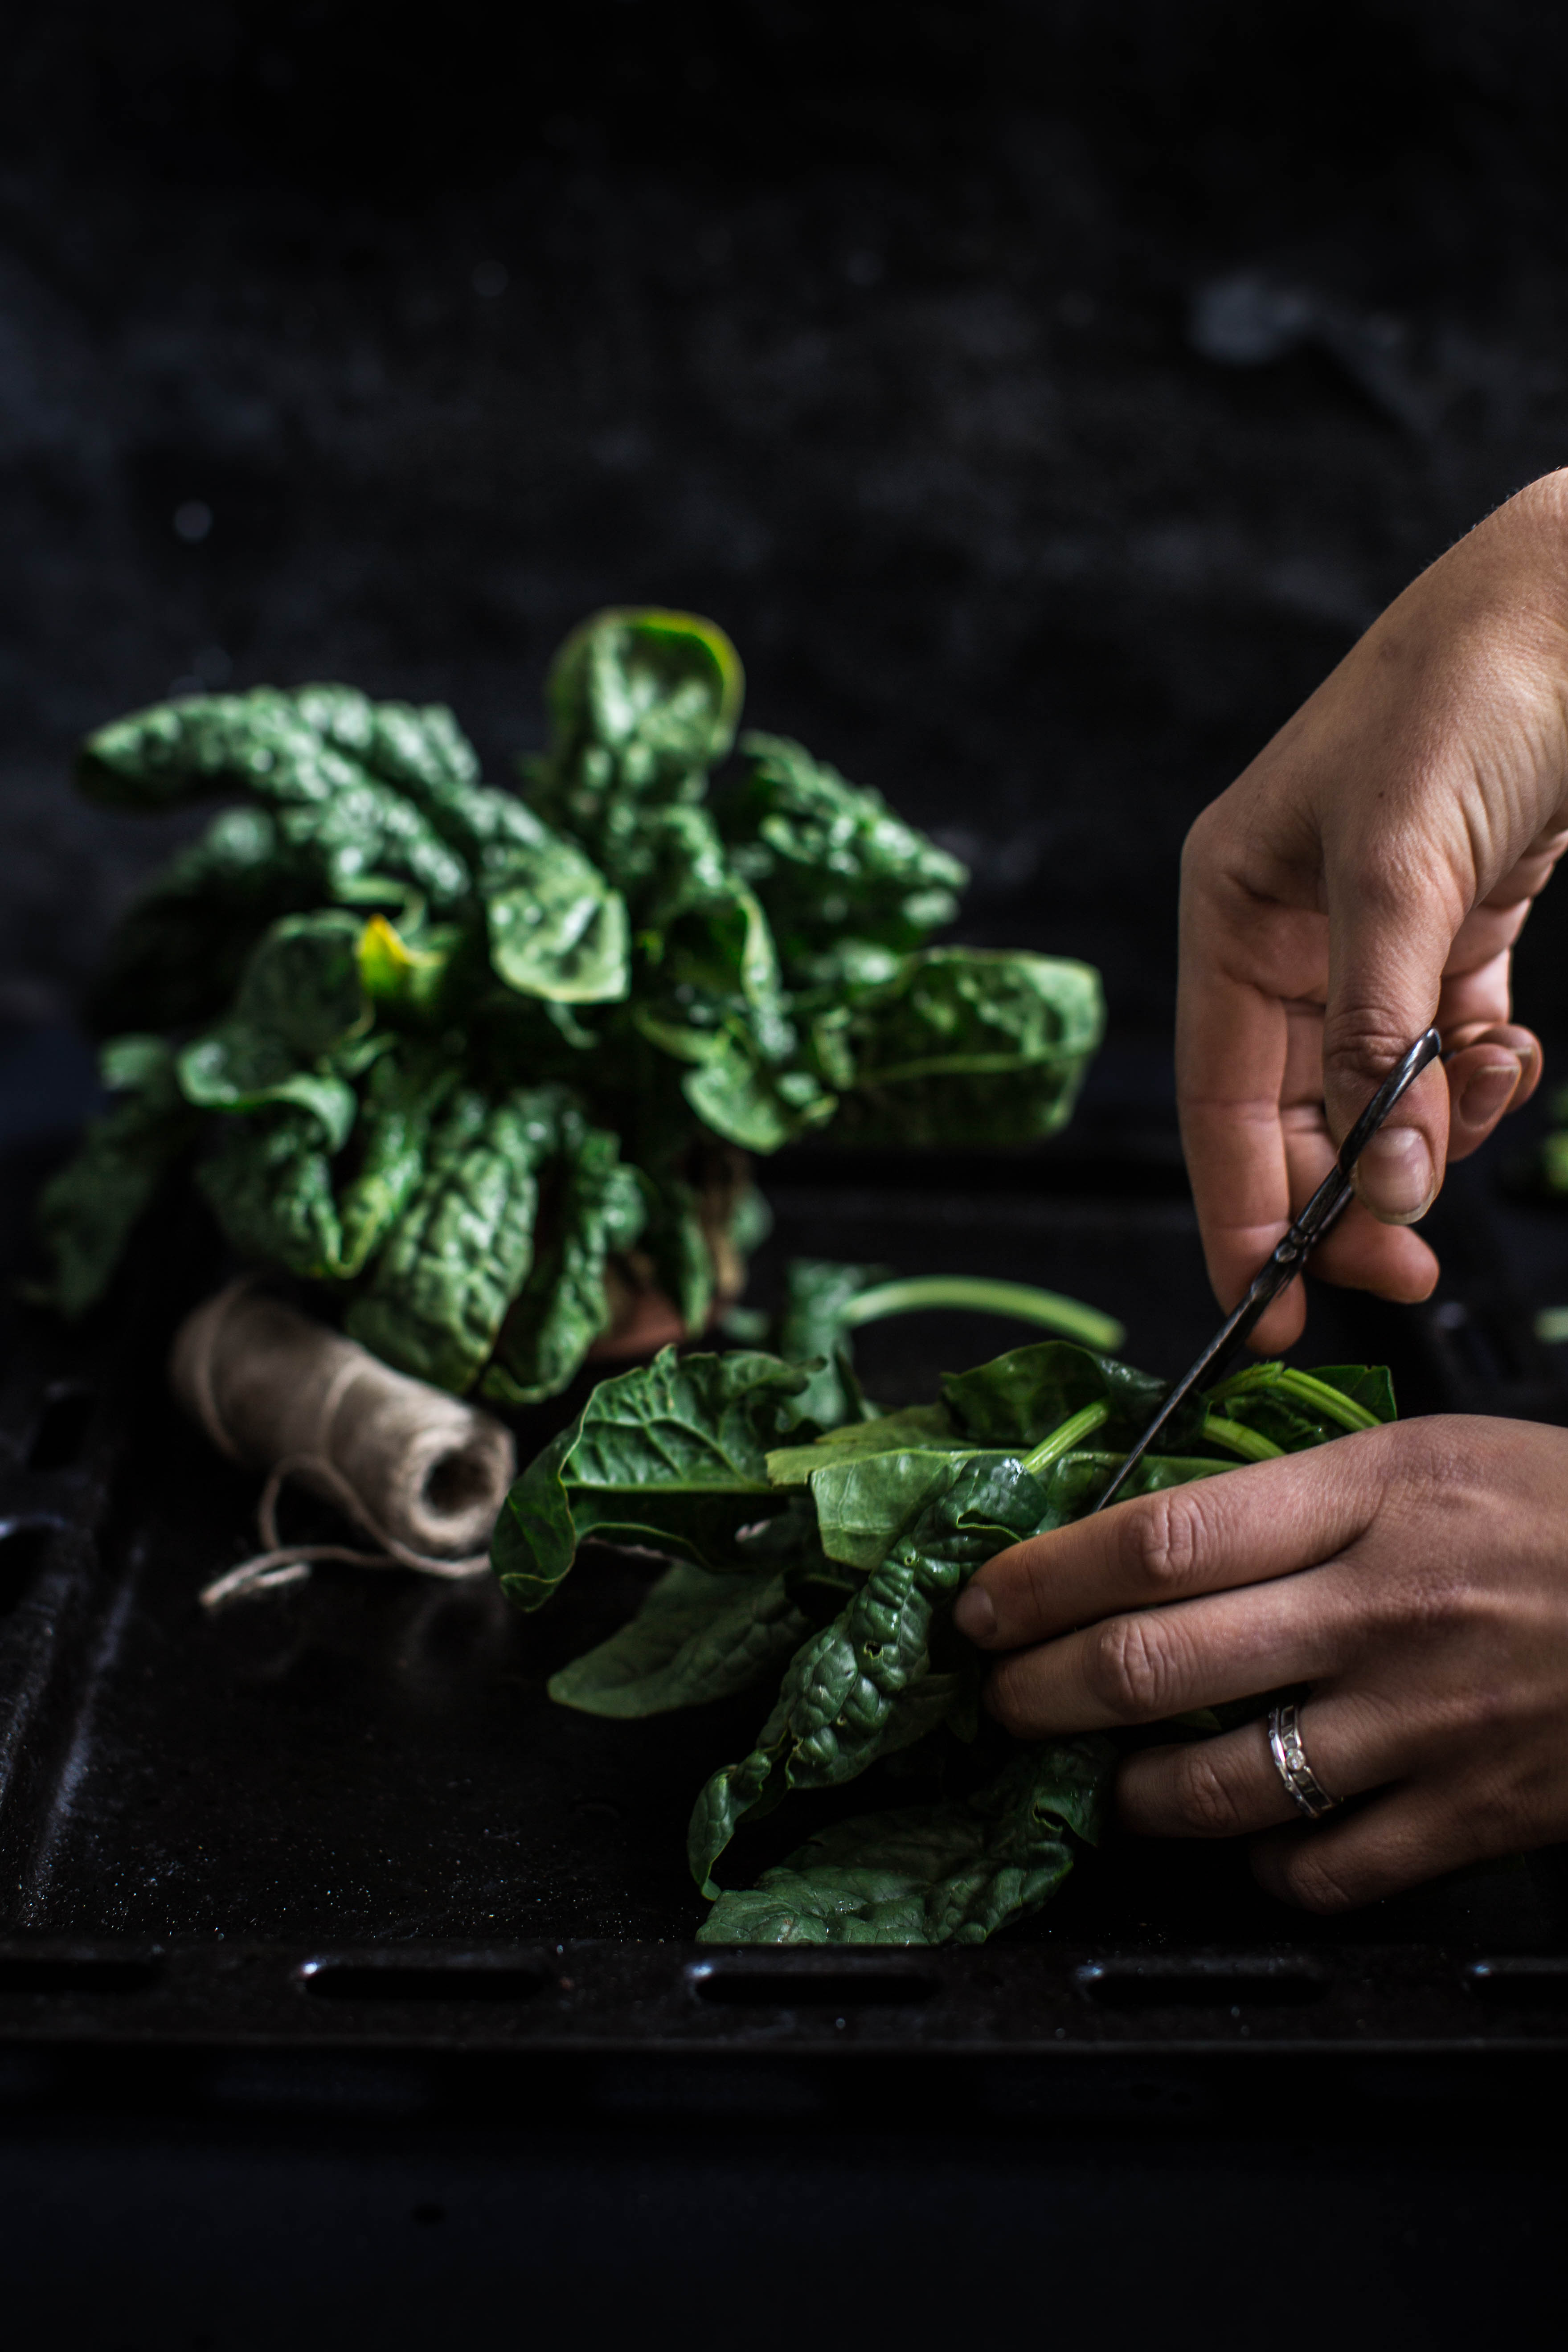 vegan glutenfree spinach tofu quiche recipe - ricetta torta salata spinaci e tofu vegan senza glutine senza uova- food photography beauty food blog